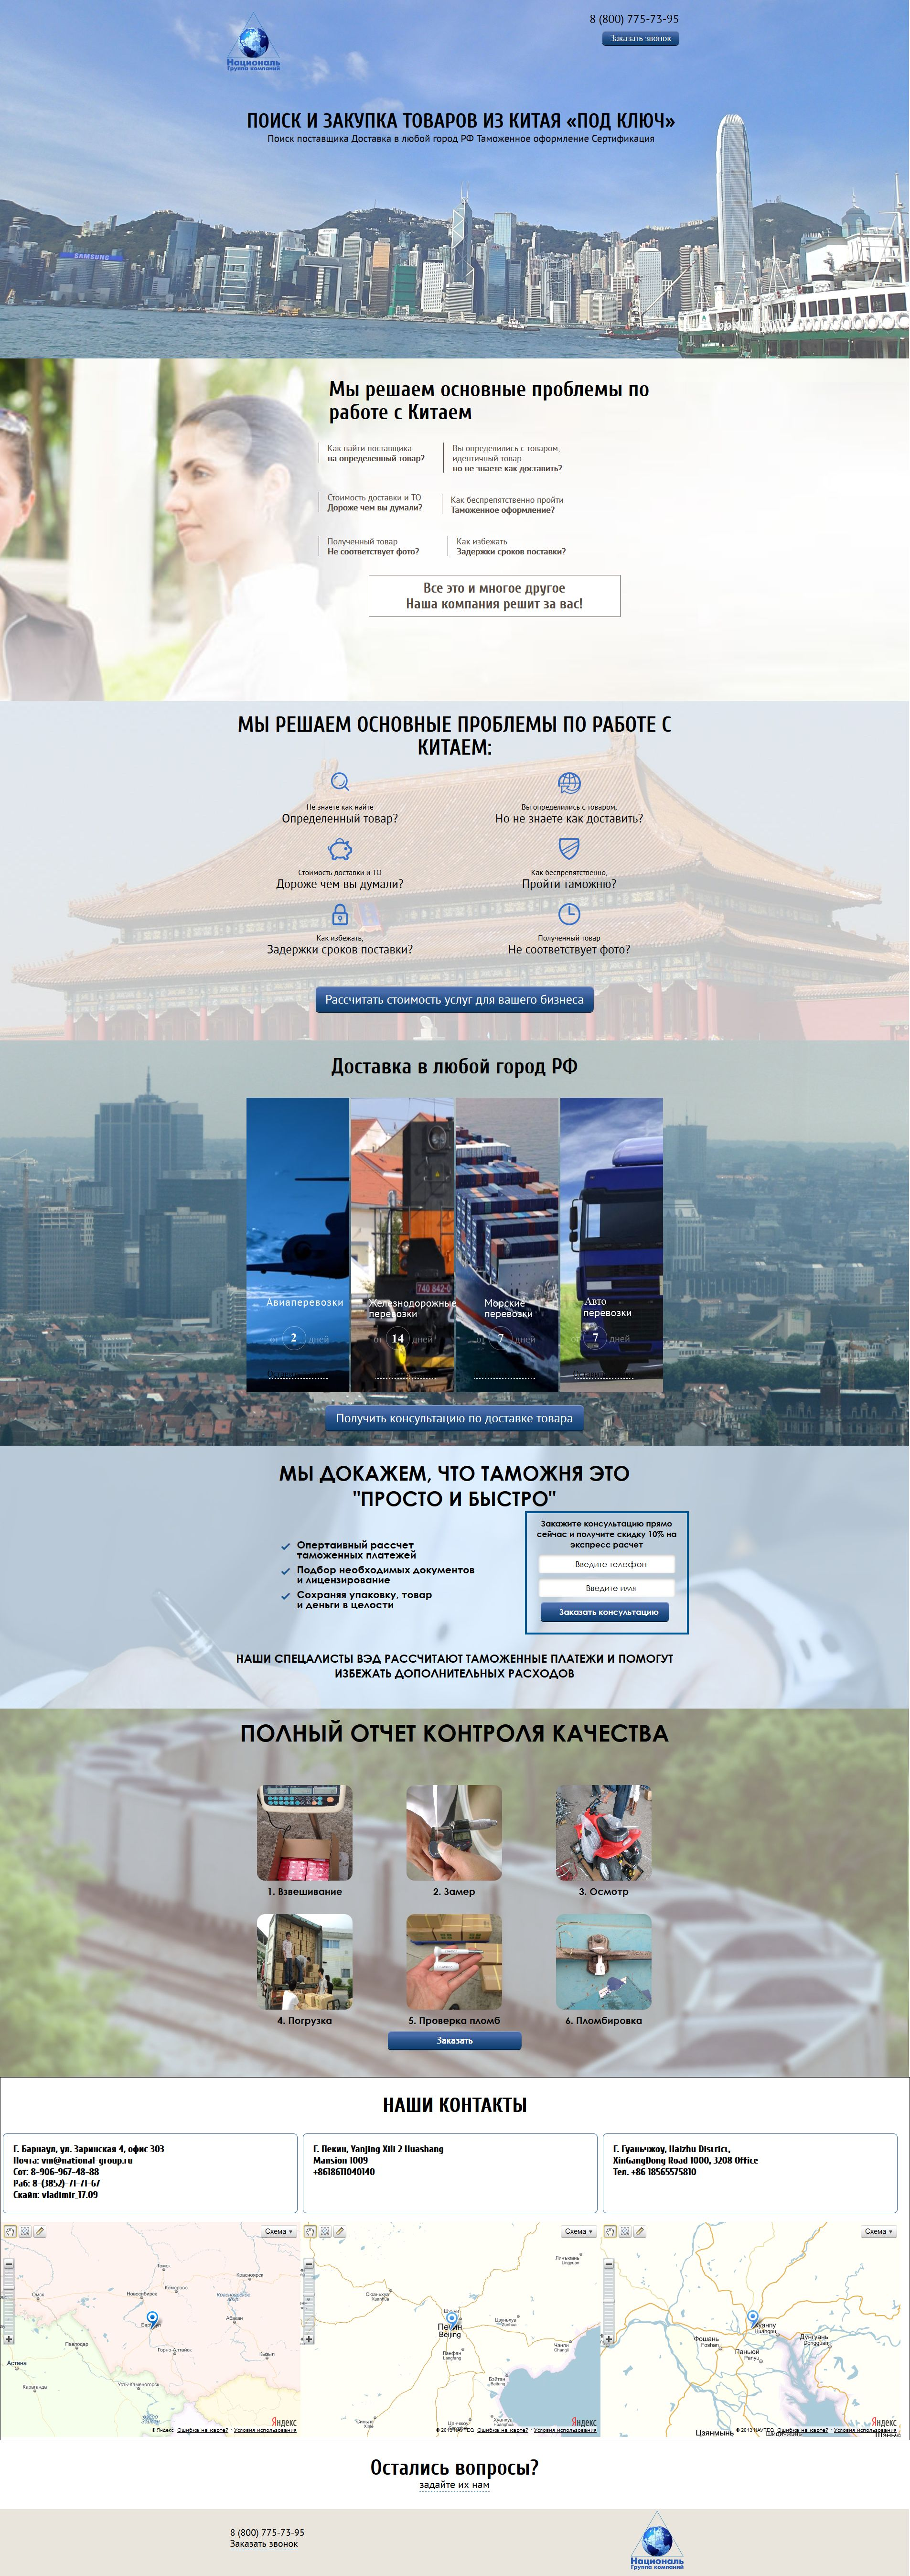 Landing Page по грузоперевозкам из Китая